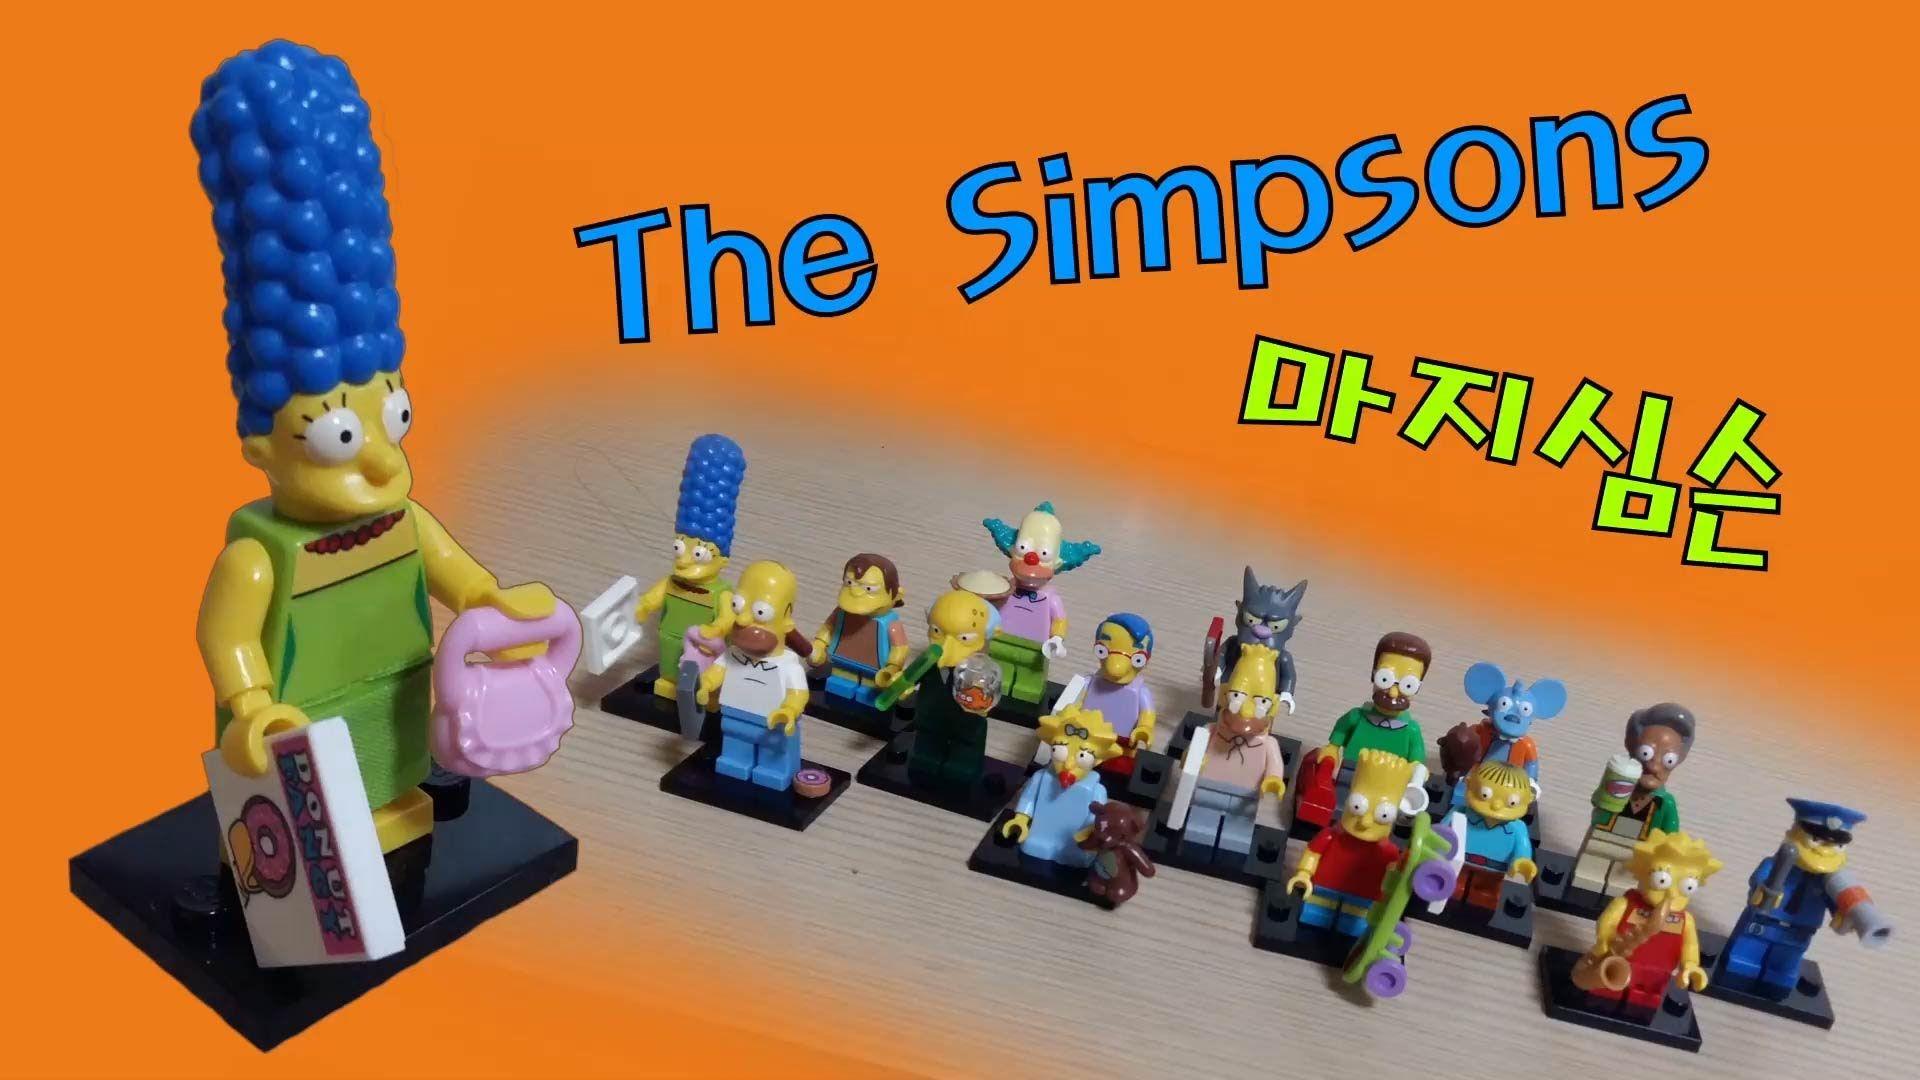 MF_The Simpsons_심슨 미니피규어_마지심슨